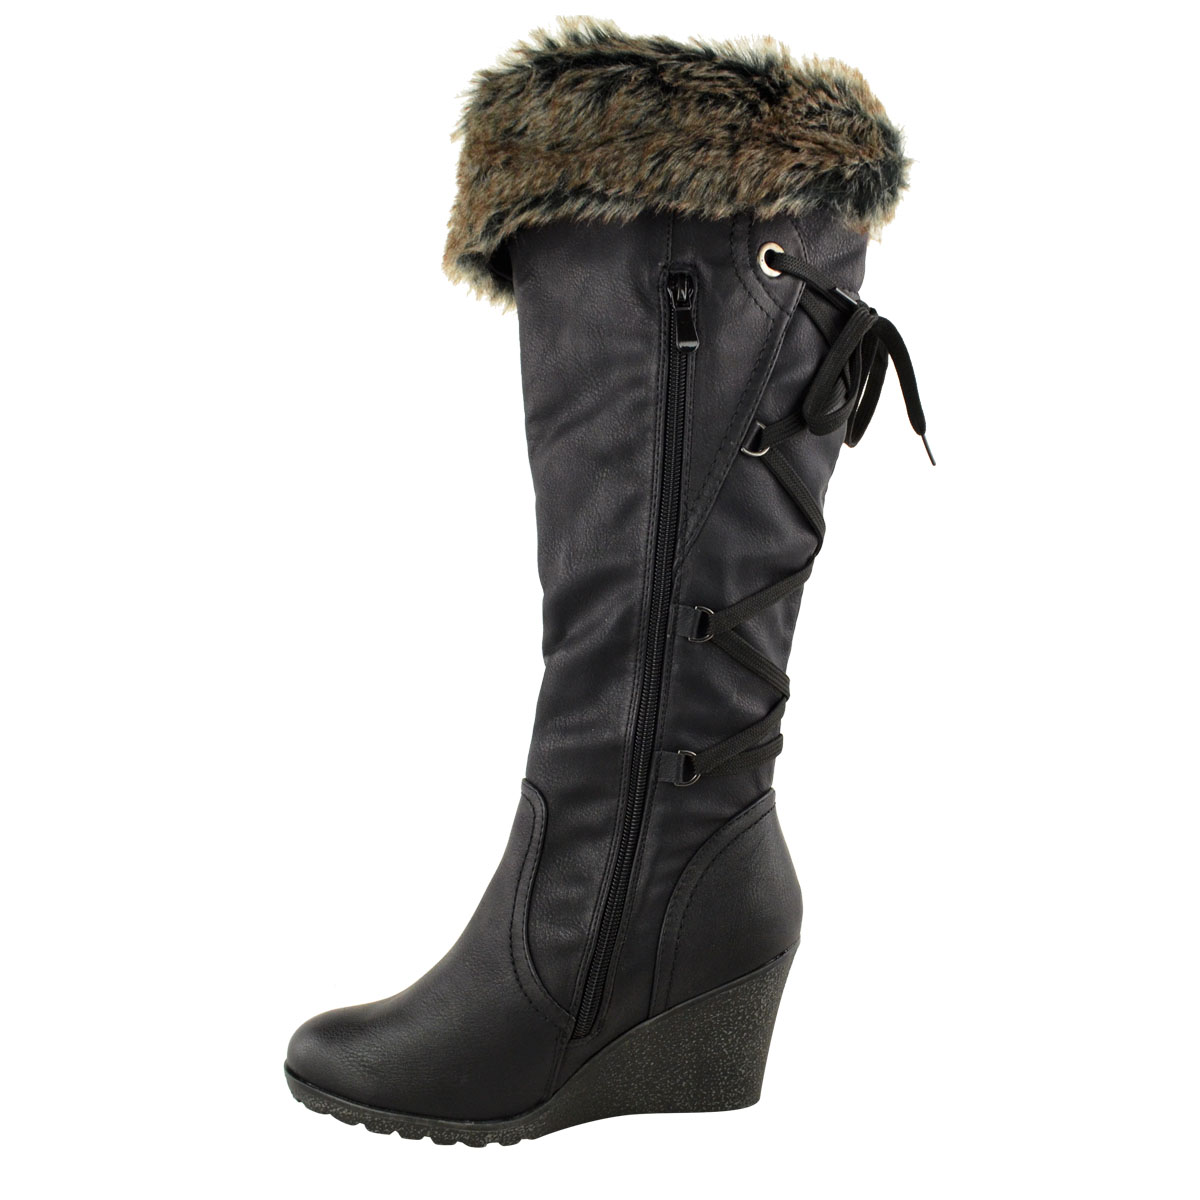 Womens-Ladies-Wedge-Low-Heel-Winter-Knee-Boots-Warm-Faux-Fur-Fleece-Size-UK thumbnail 4